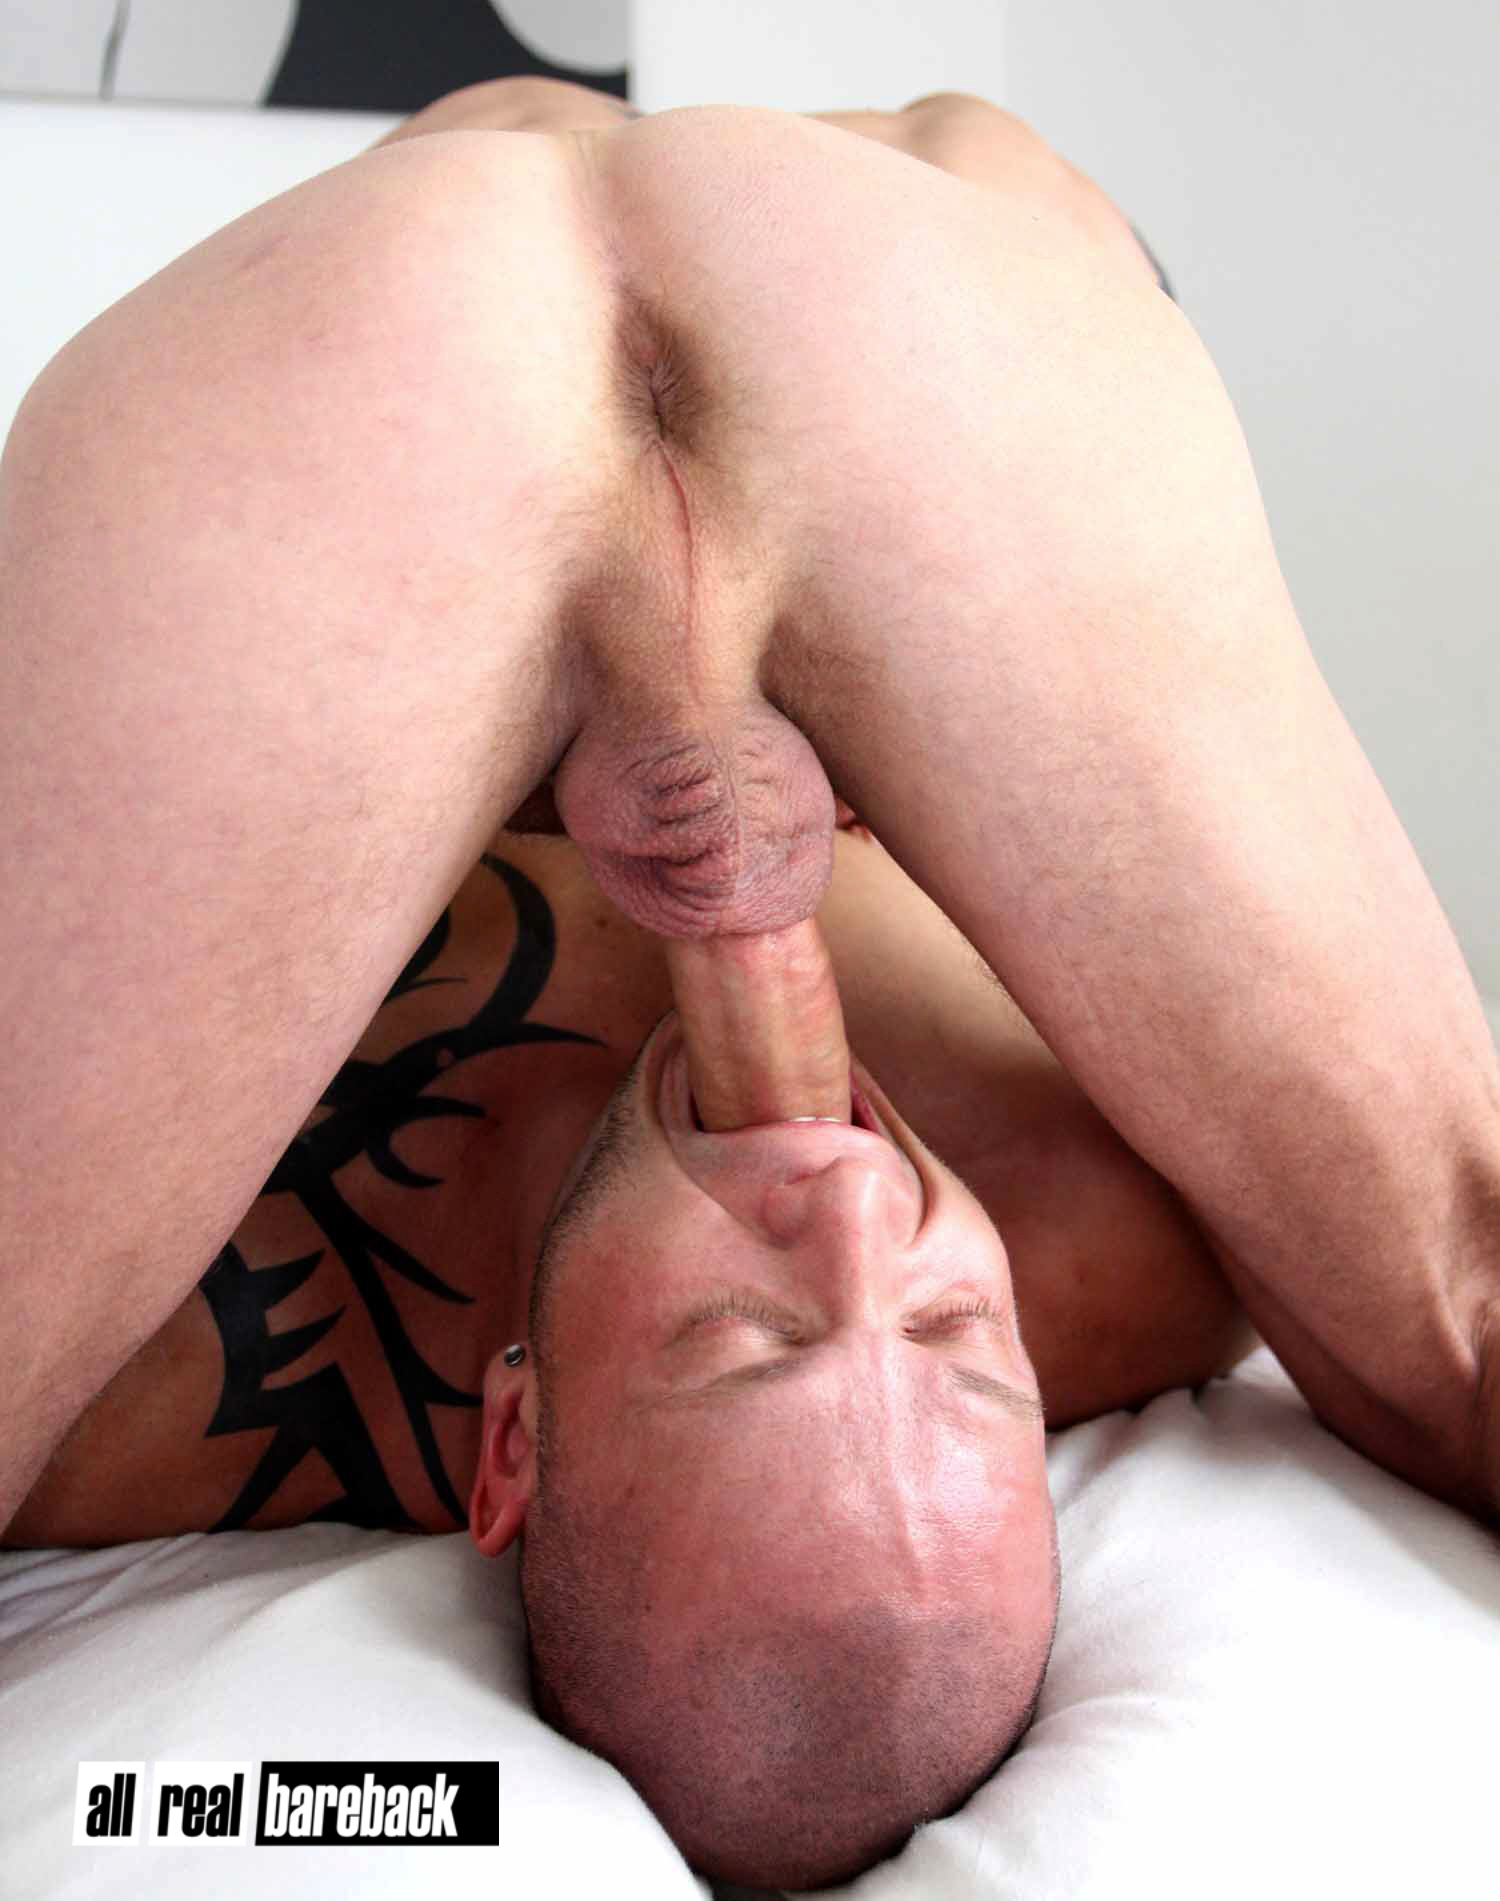 All-Real-Bareback-Sam-Porter-and-Steve-Rilla-Huge-Cock-Barebacking-Gay-Porn-14 Amateur Hung British Top Barebacks A German Muscle Bottom